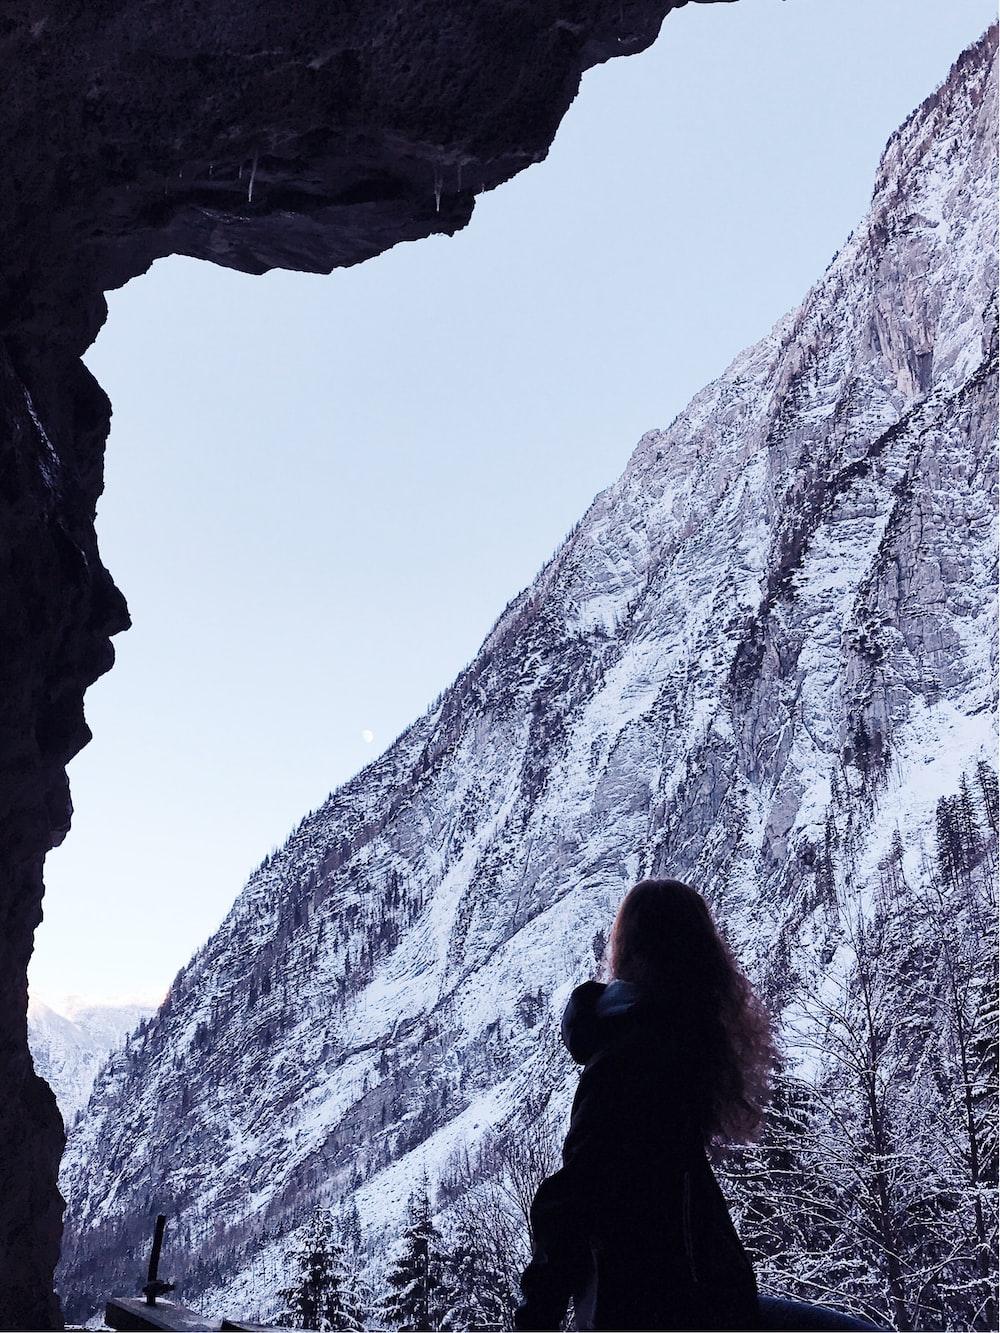 woman in black top standing near mountain